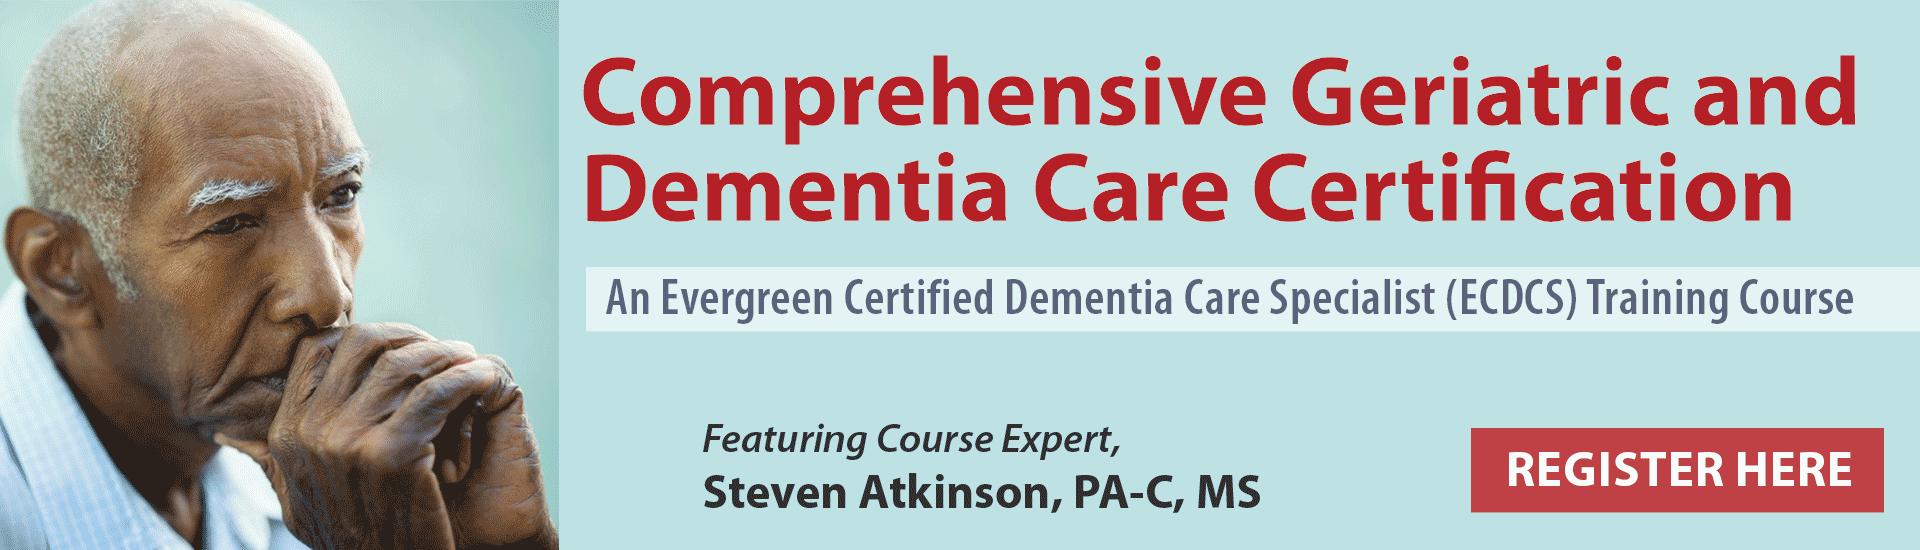 Comprehensive Geriatric and Dementia Care Certification